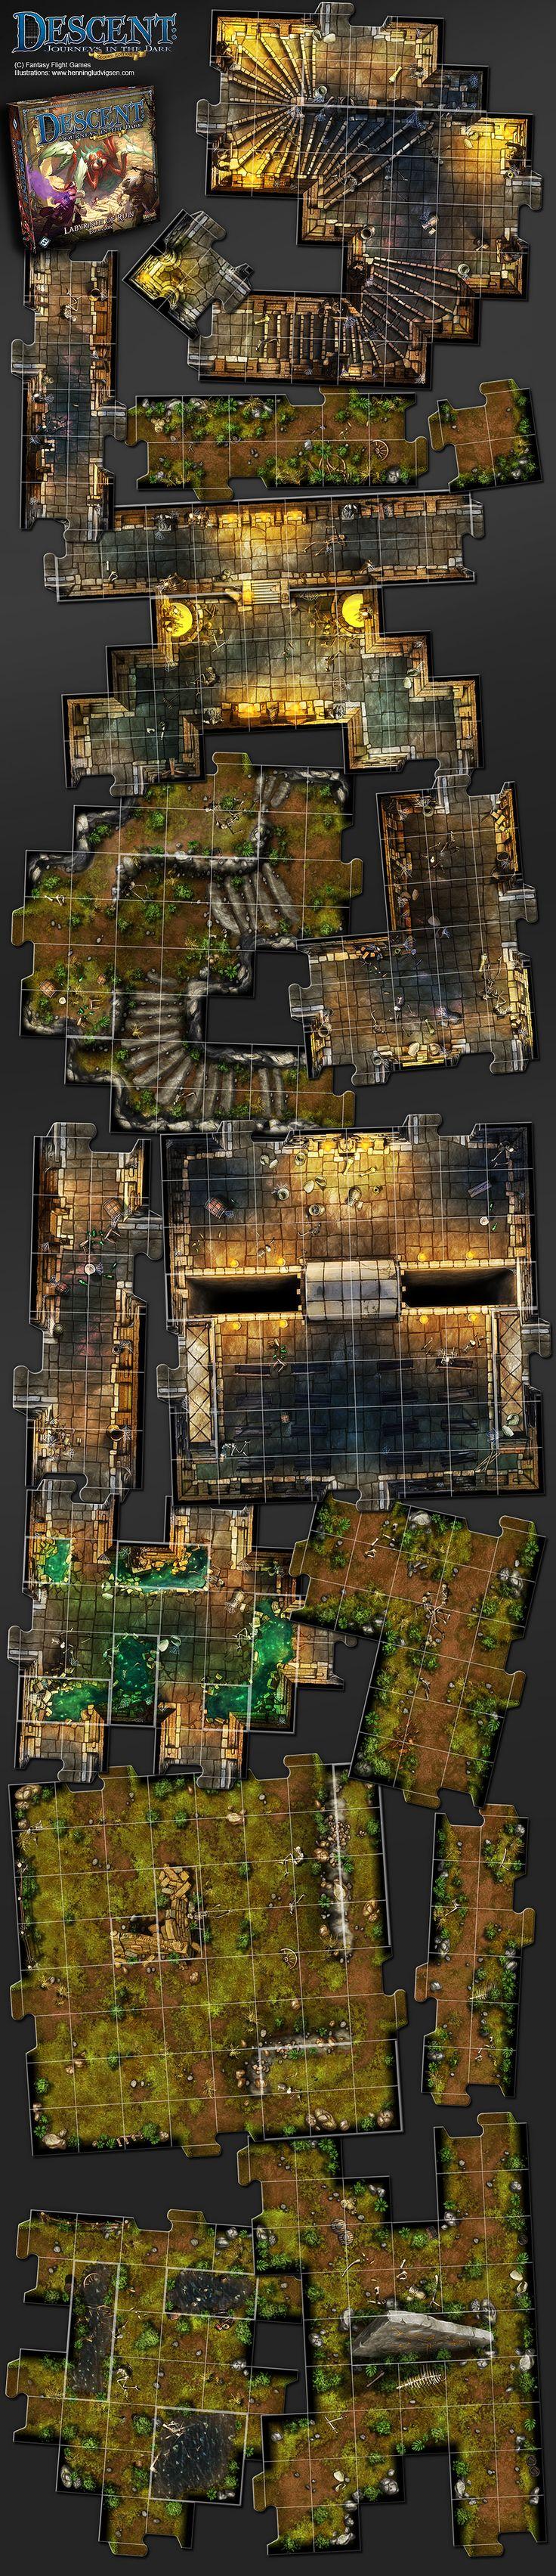 Descent, Labyrinth Of Ruin expansion by henning.deviantart.com on @DeviantArt